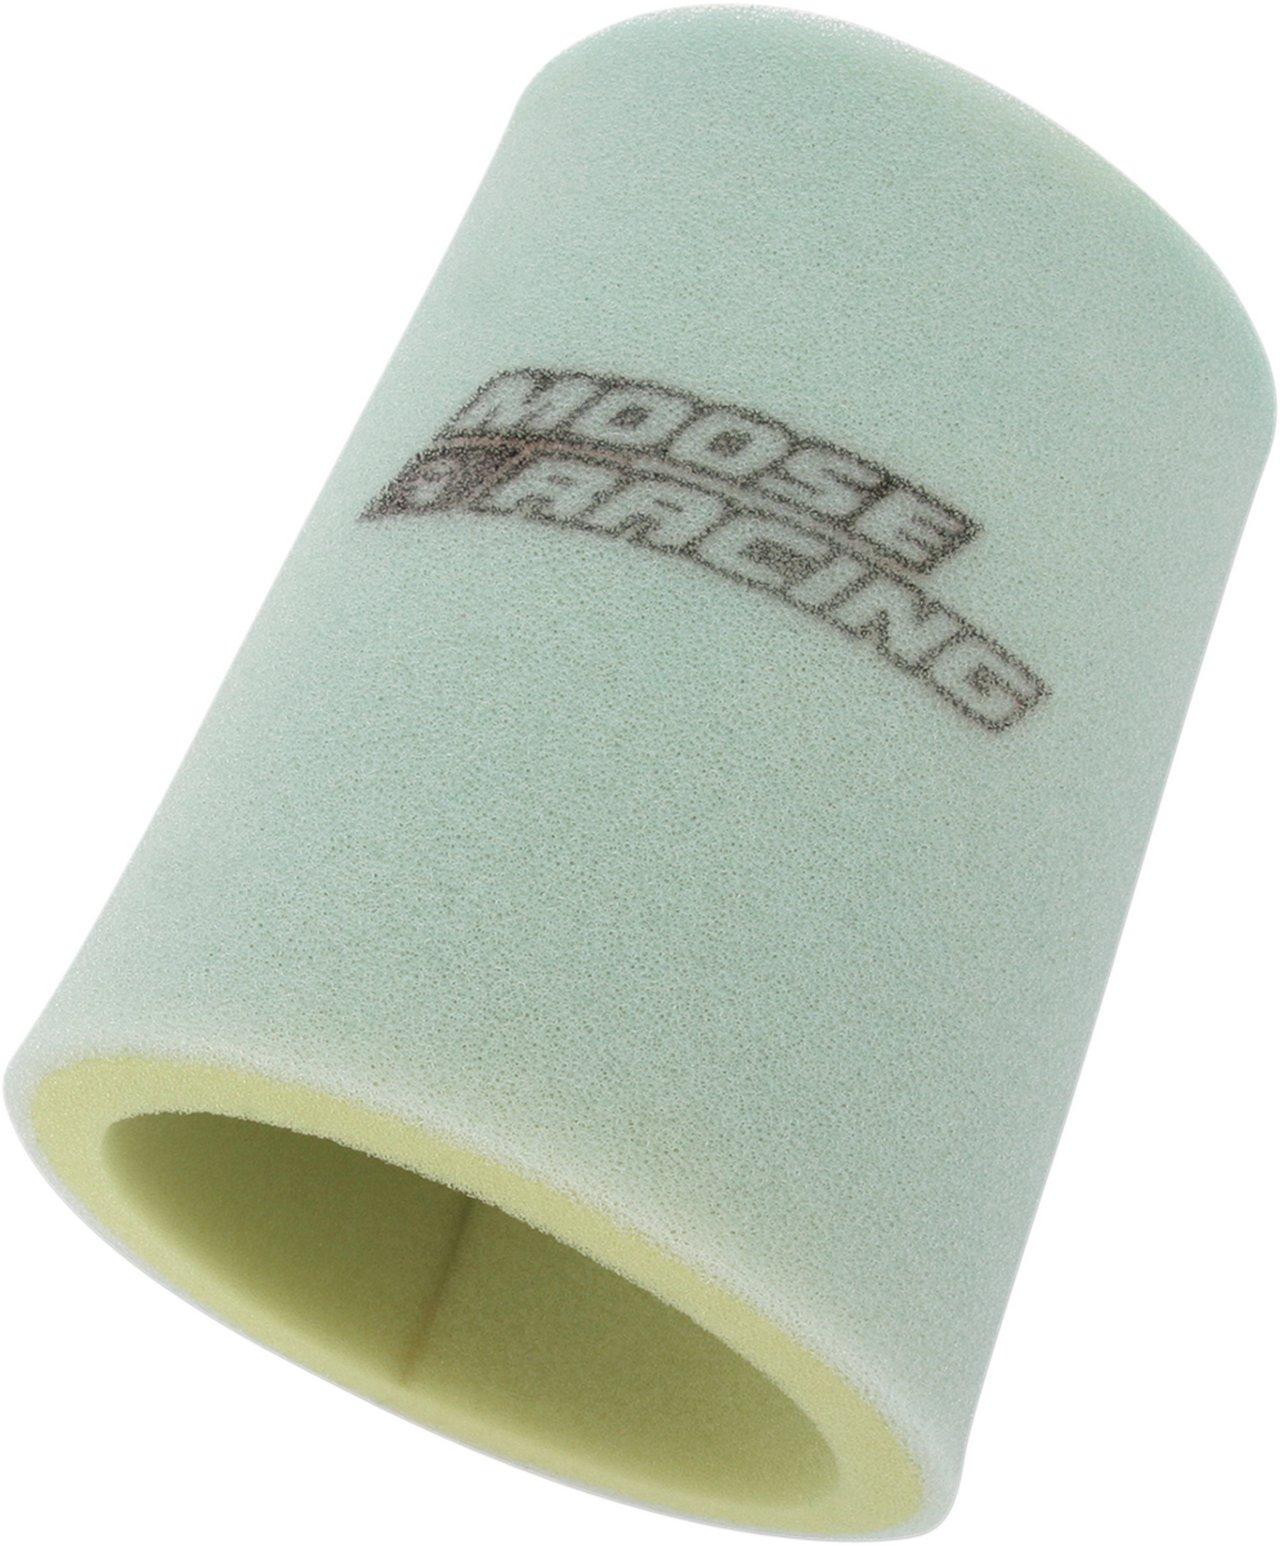 【MOOSE RACING】PPO (PRECISION PRE-OILED) 空氣濾芯 [1011-2039] - 「Webike-摩托百貨」